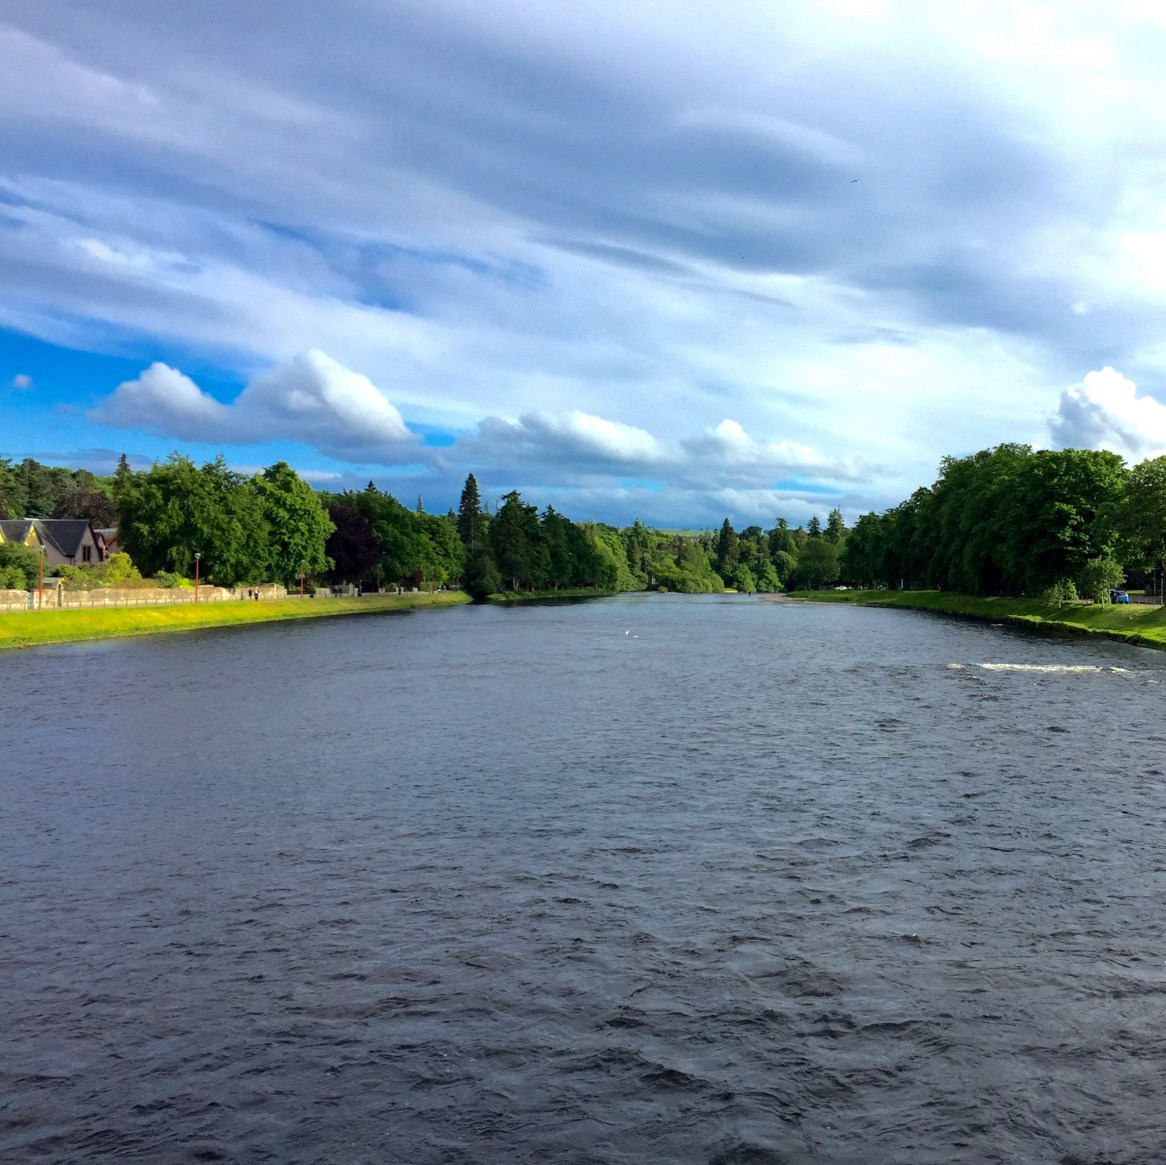 inverness-scotland-3538